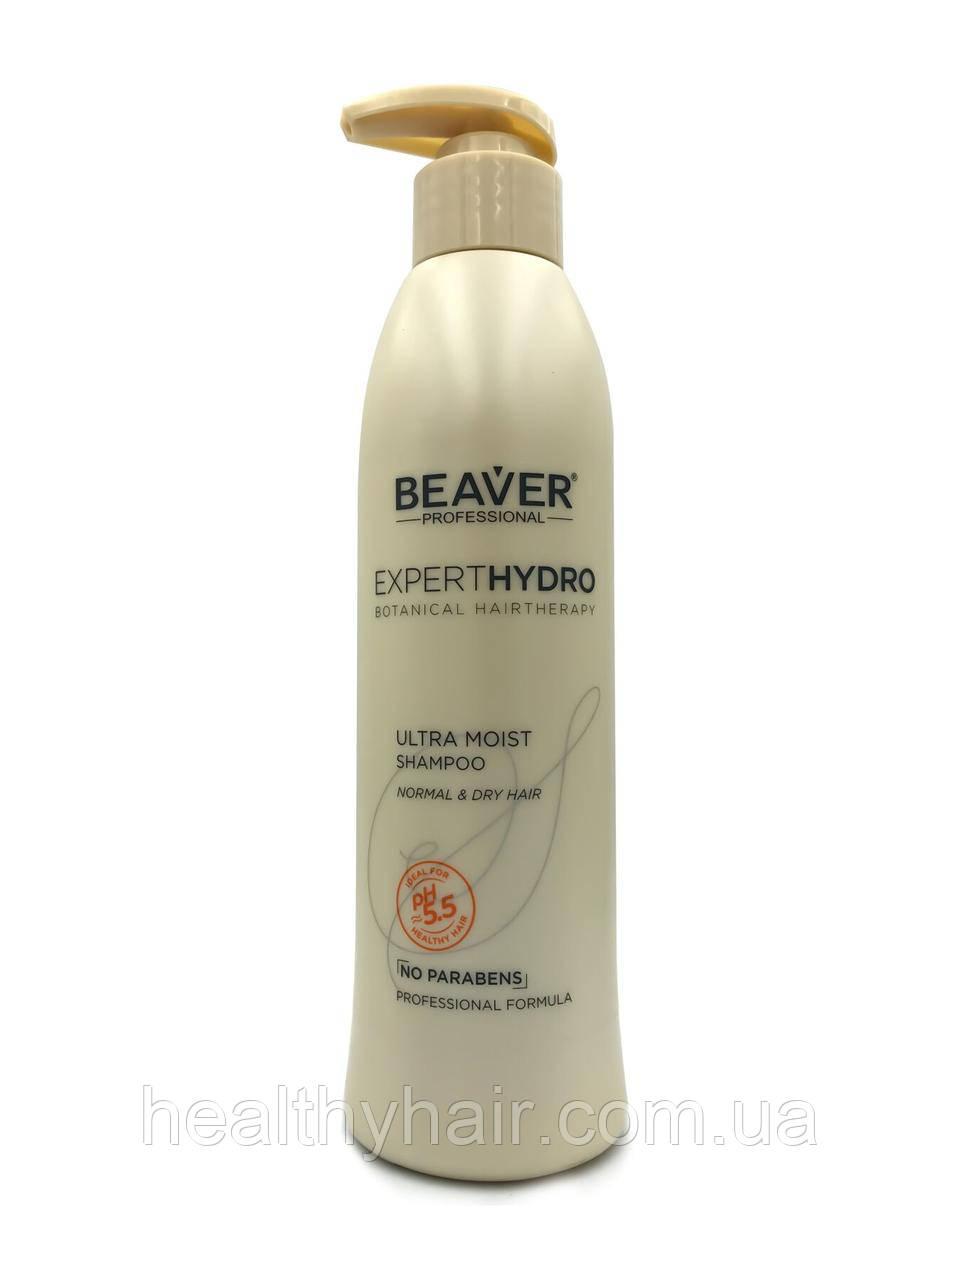 Beaver Hydro Expert Ultra Moisture Shampoo Шампунь для сухих волос ультра увлажняющий 318 мл